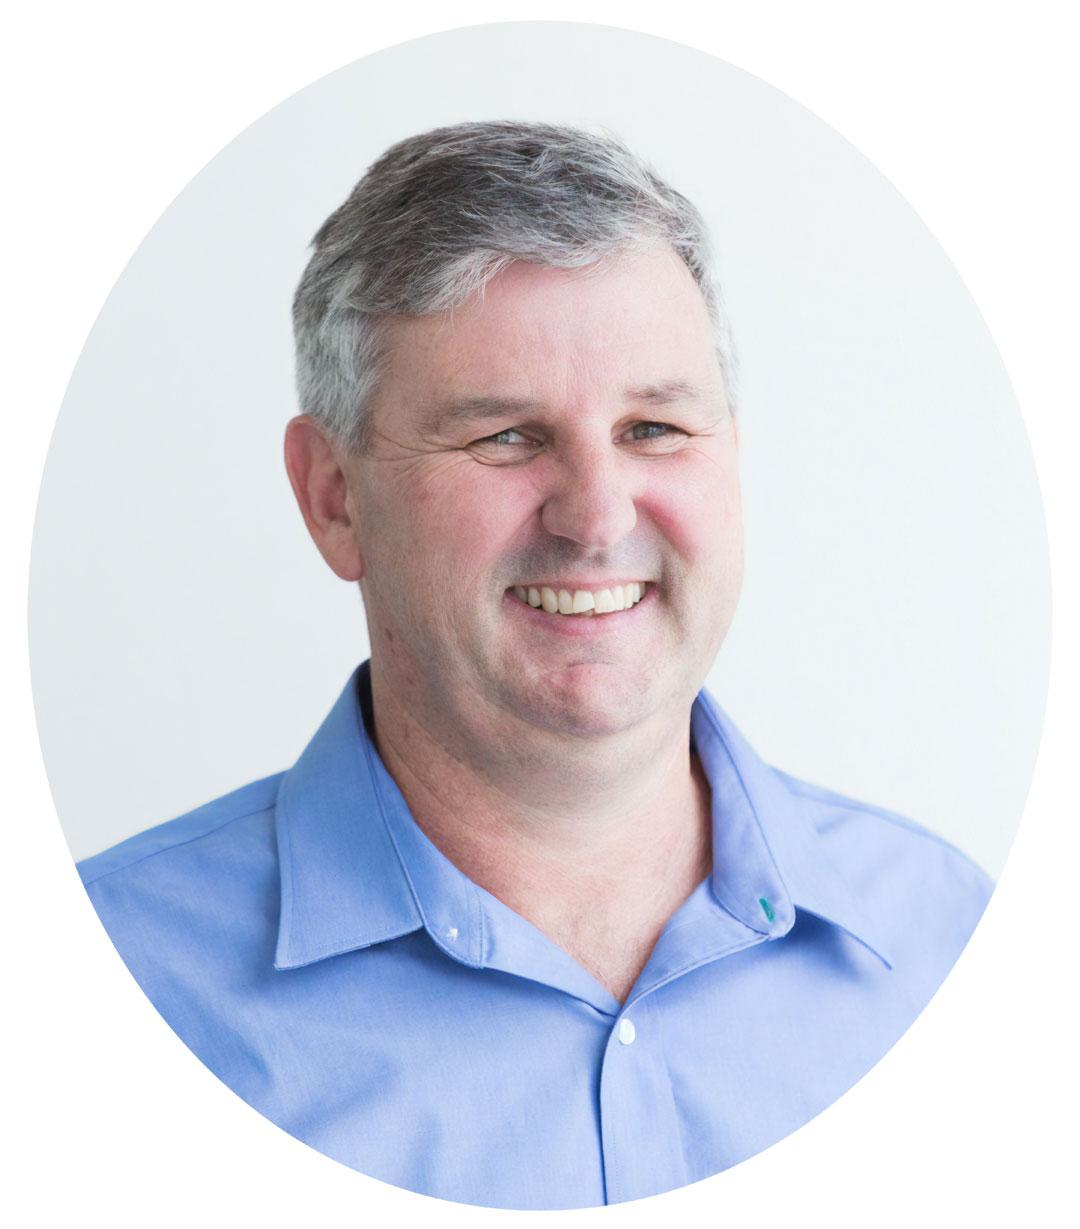 Anthony O'Flynn - Senior mortgage adviser at IFA Mortgages & Finance